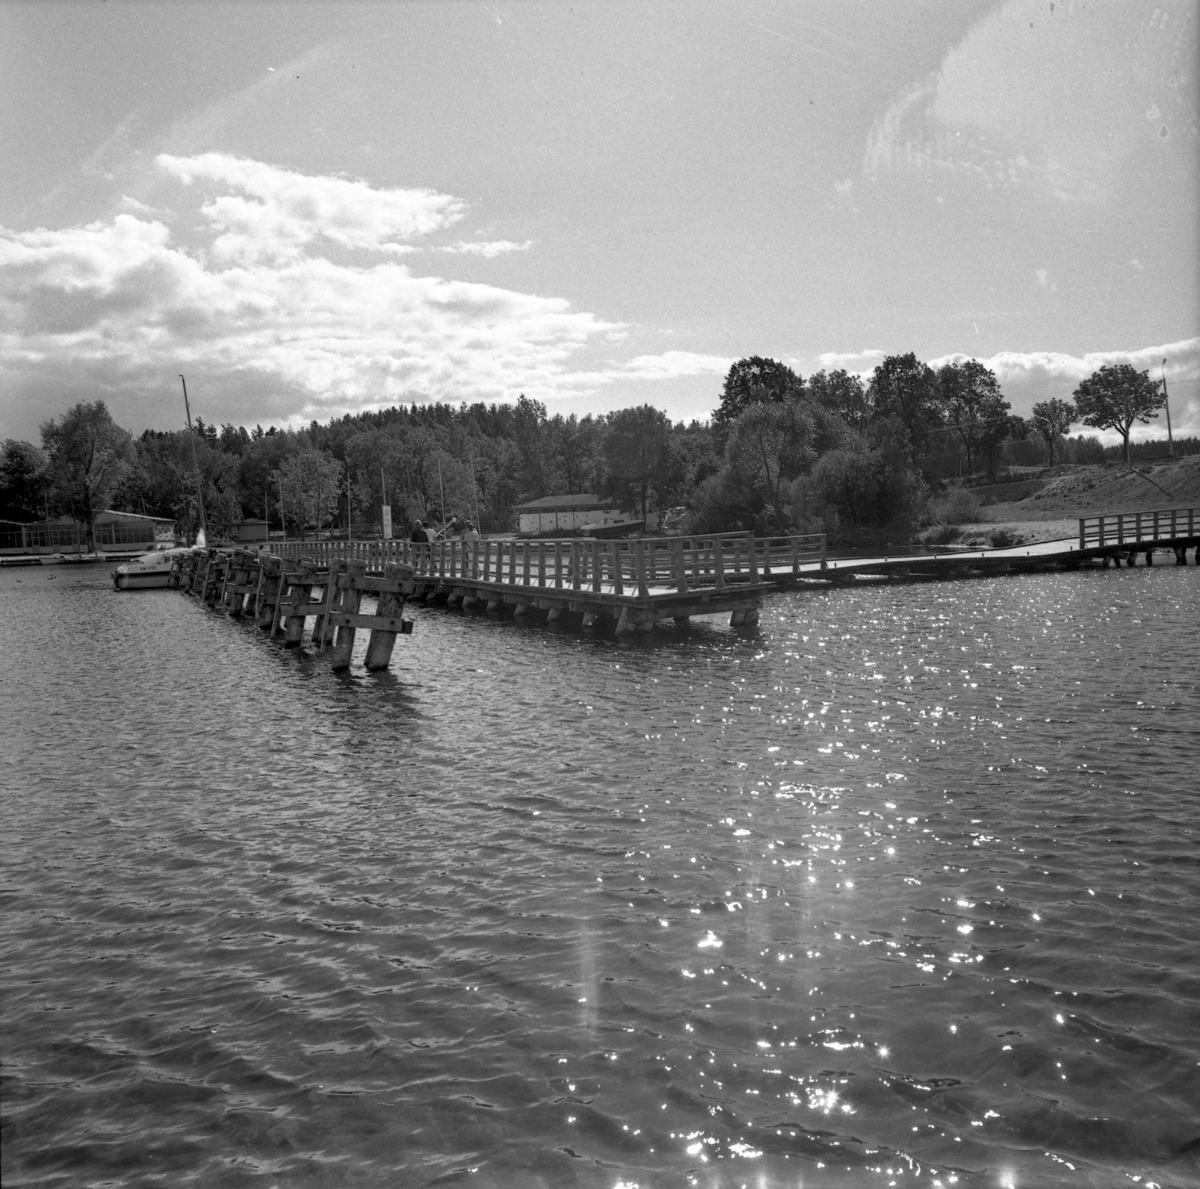 Port AZS w Wilkasach [2]